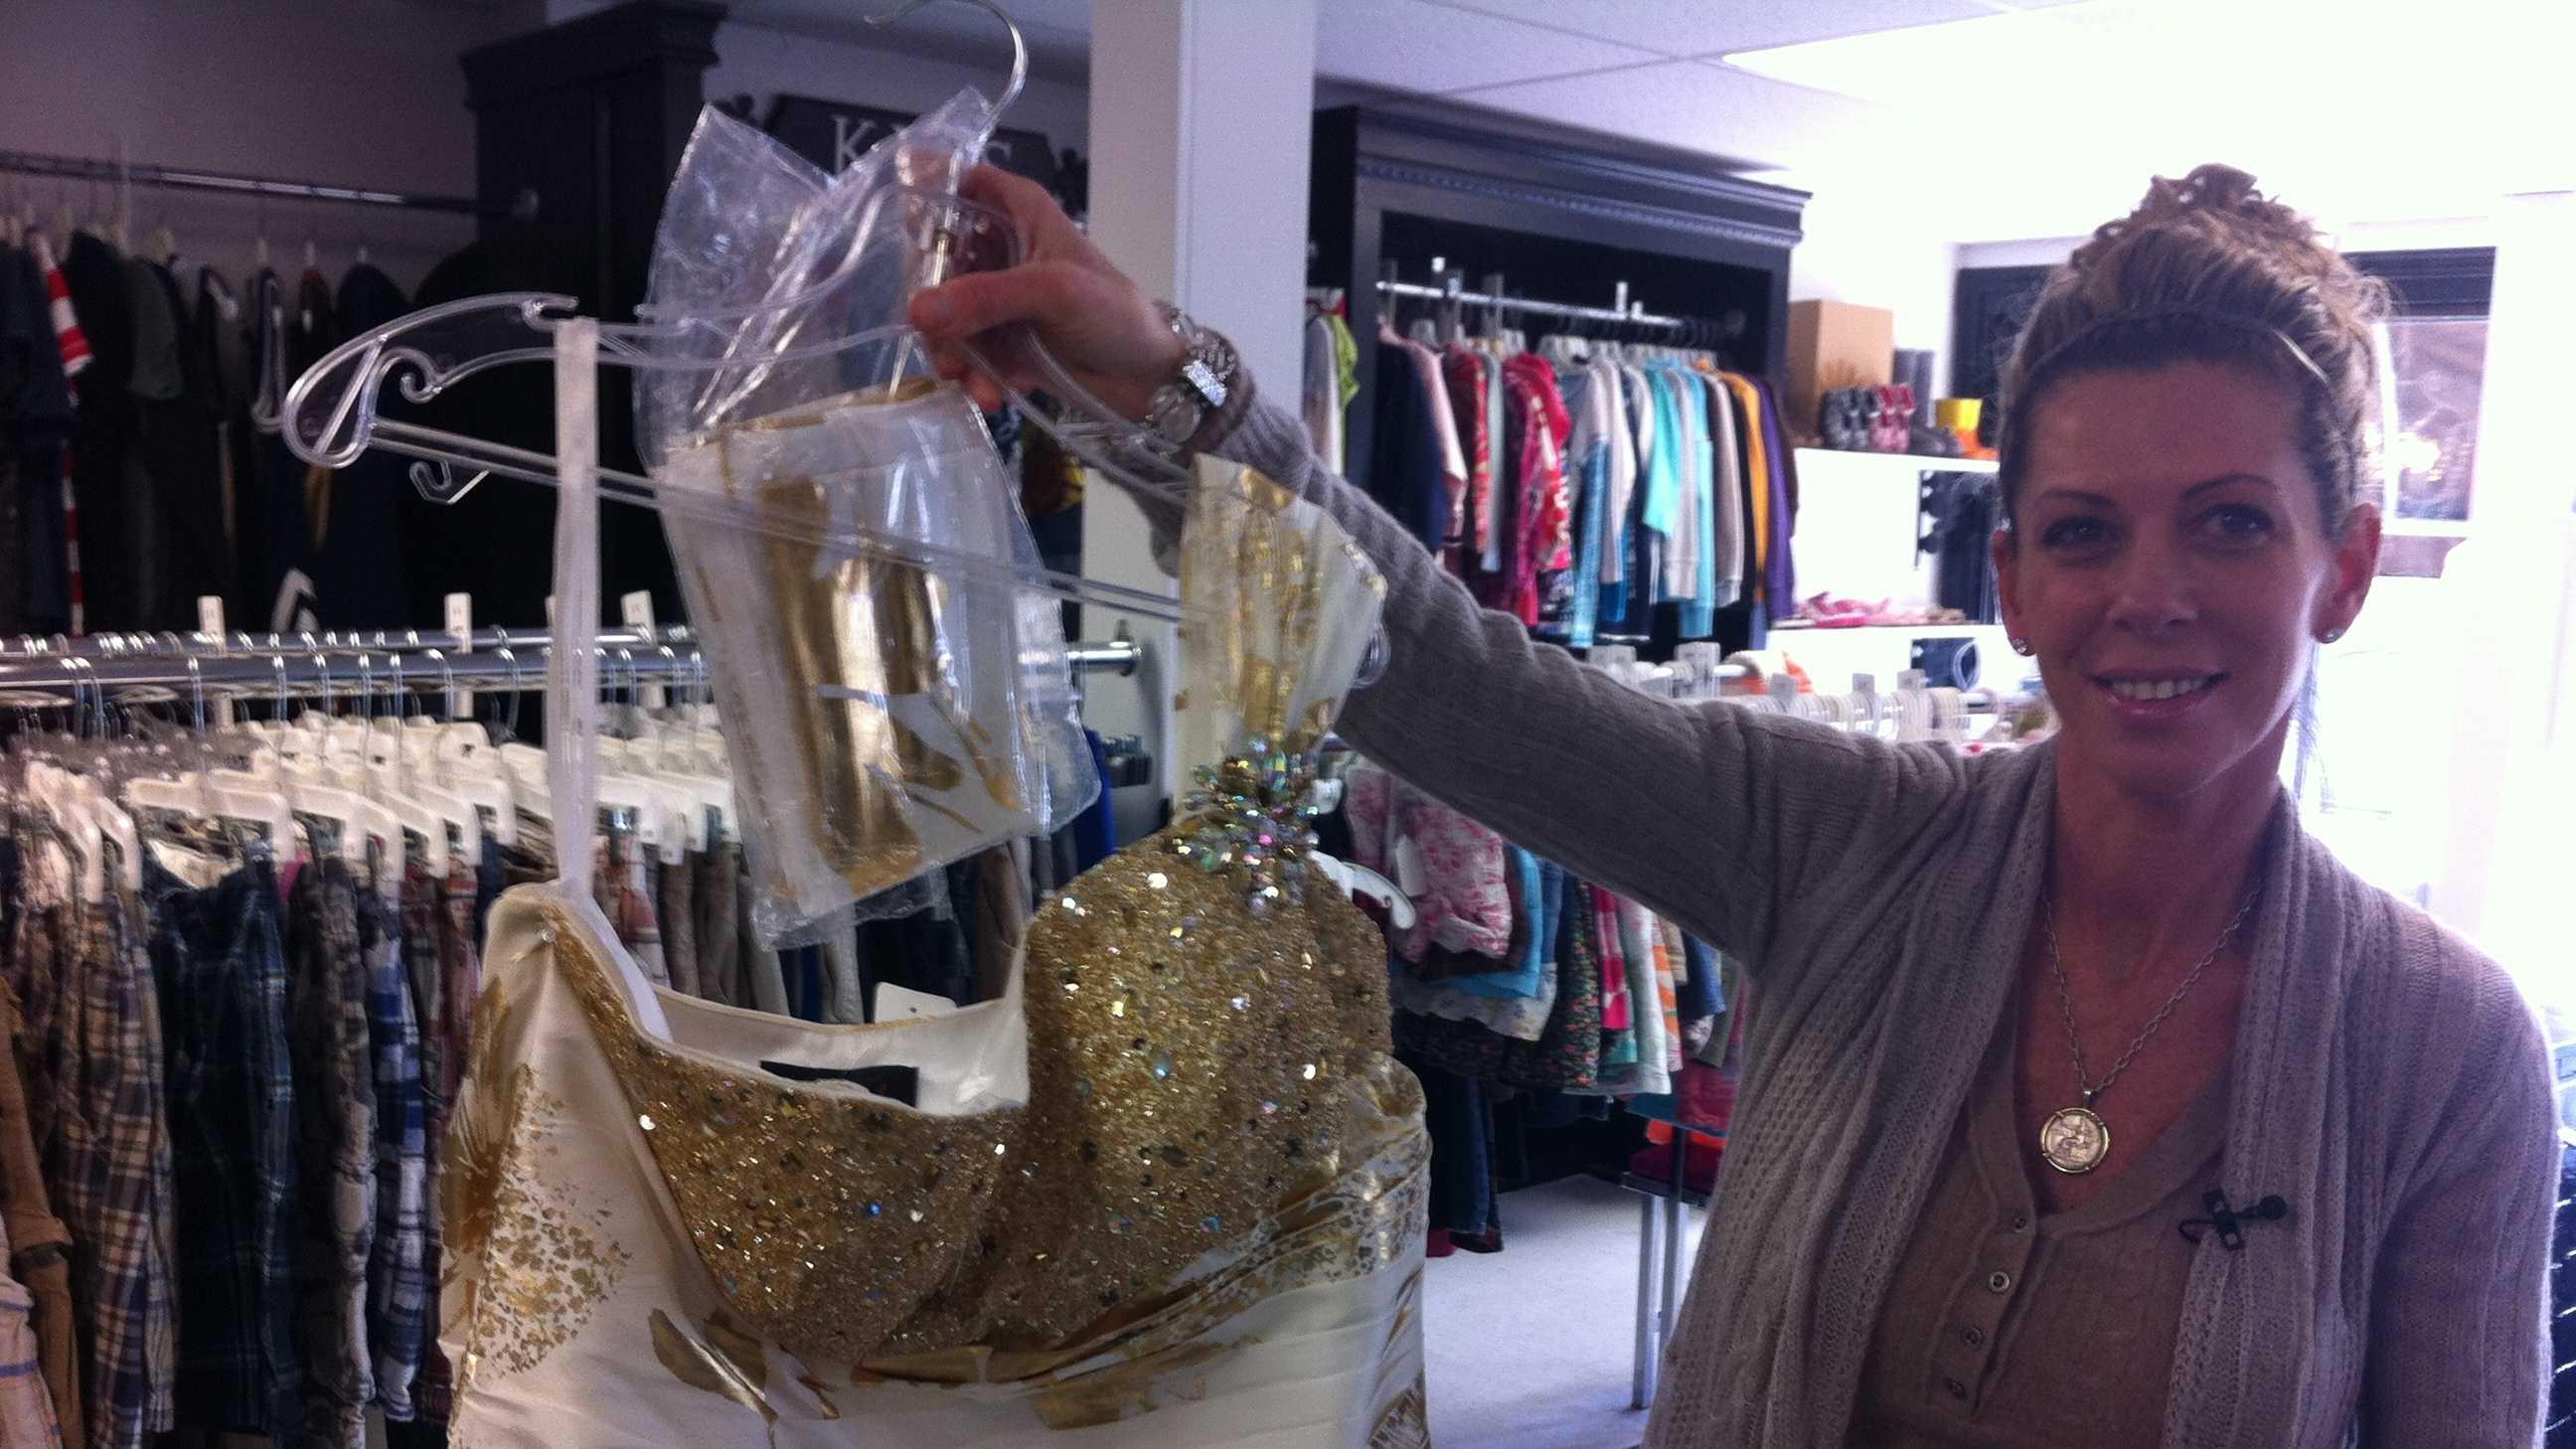 Abington prom dress